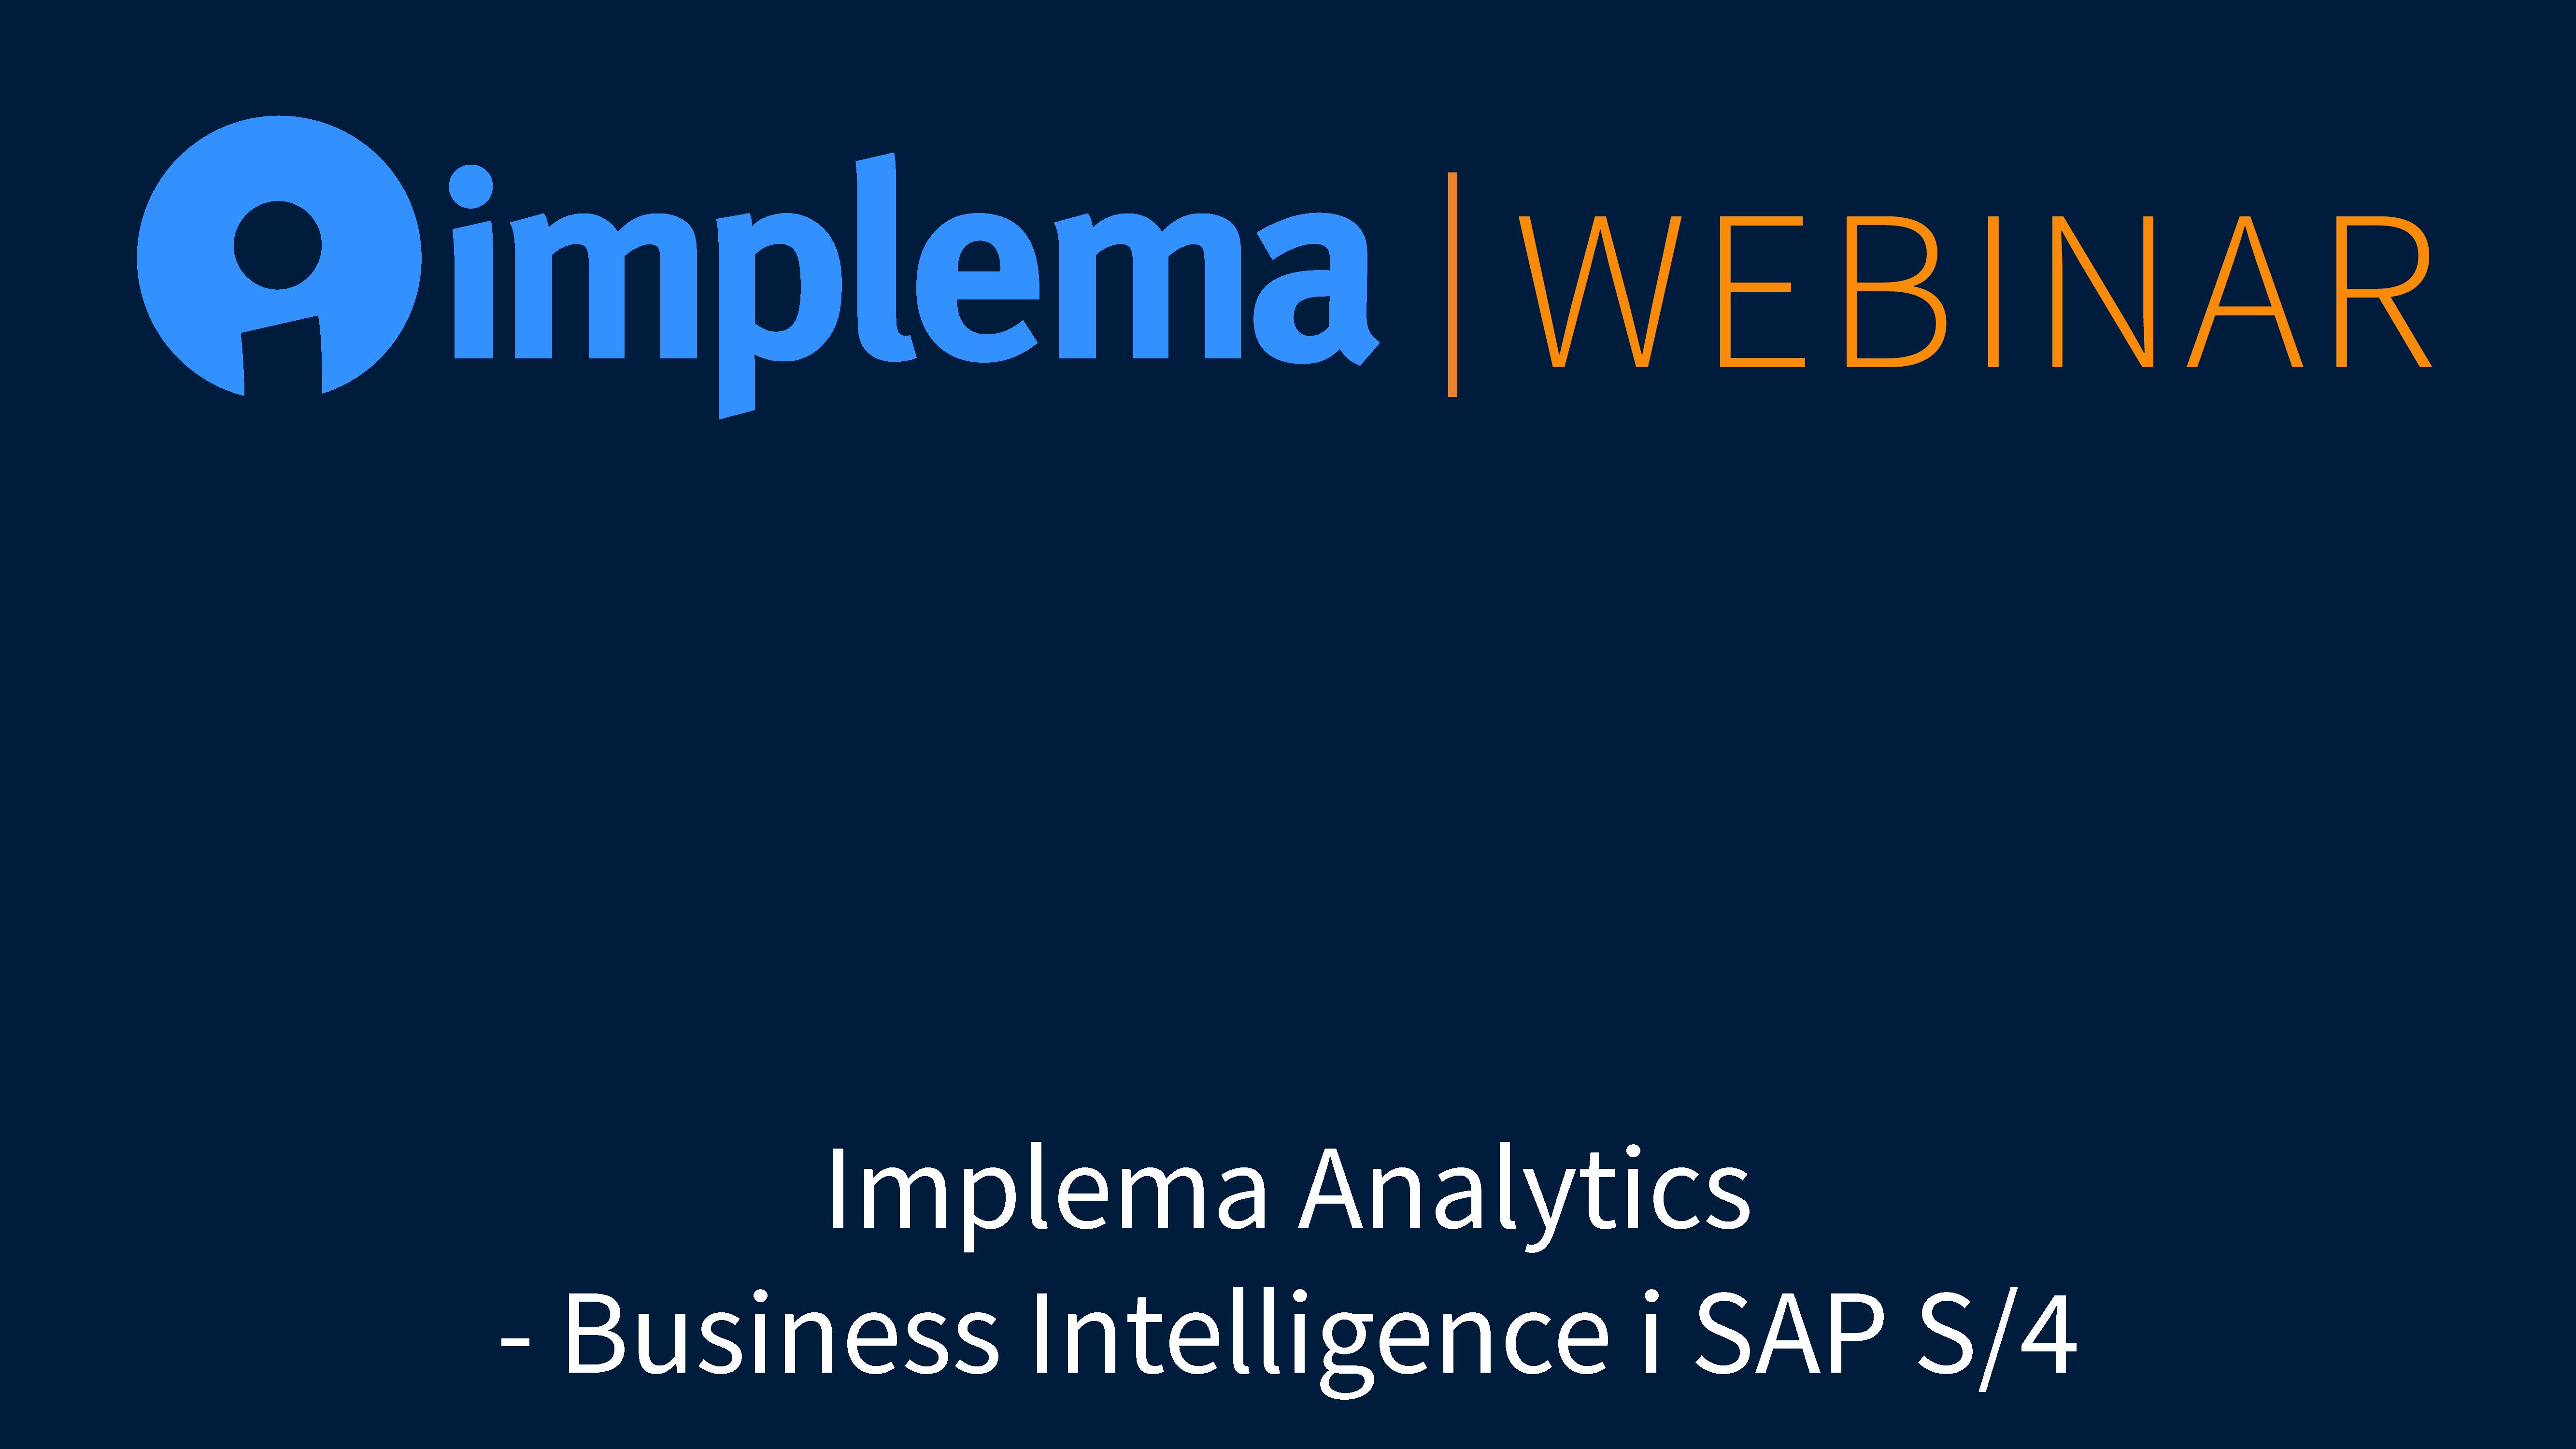 Business Intelligence i SAP S/4